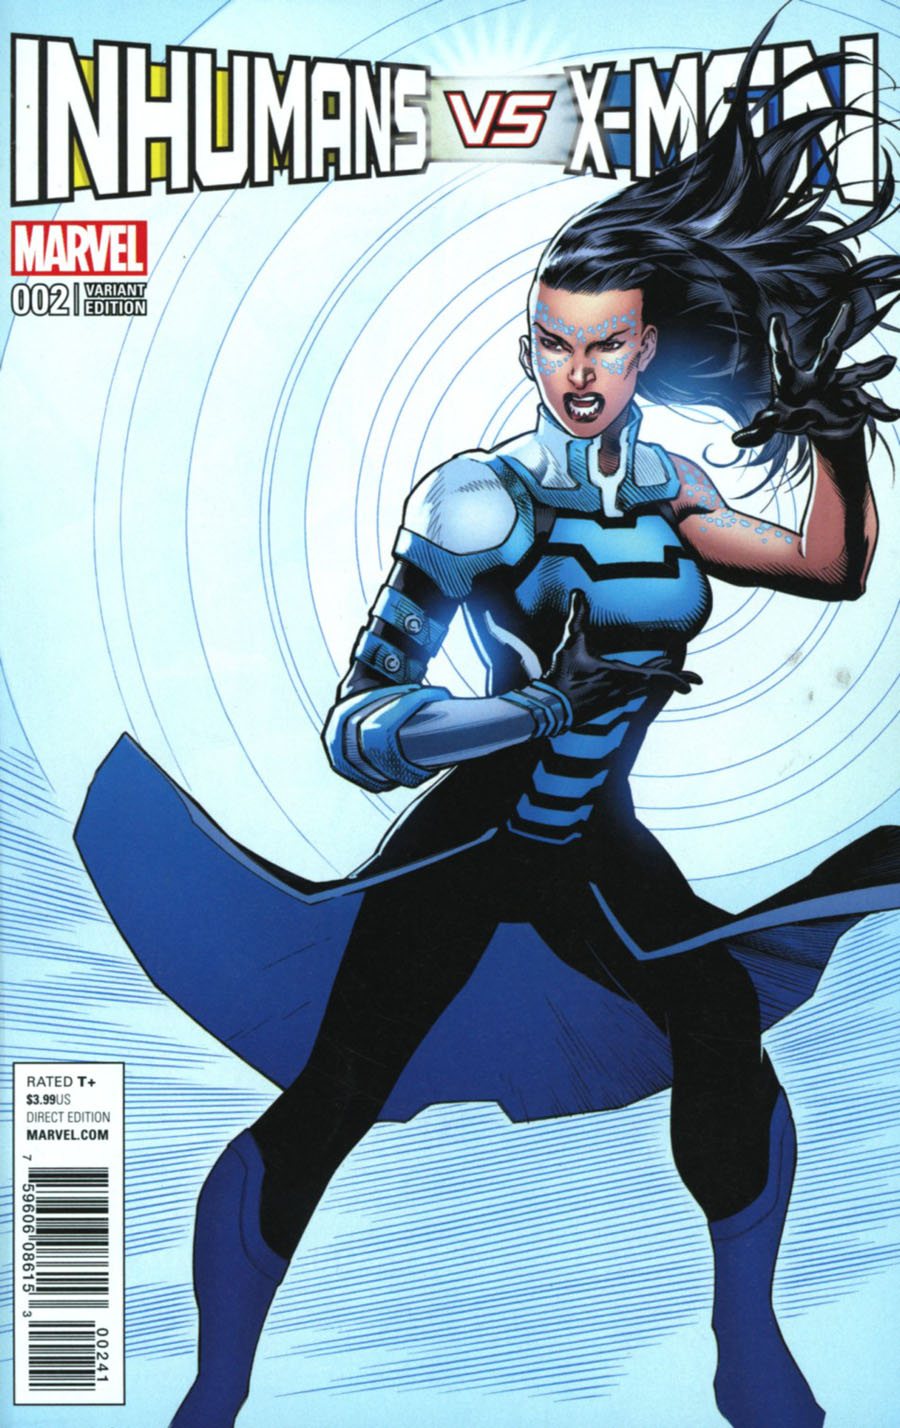 Inhumans vs X-Men #2 Cover C Variant Ardian Syaf Inhumans Cover